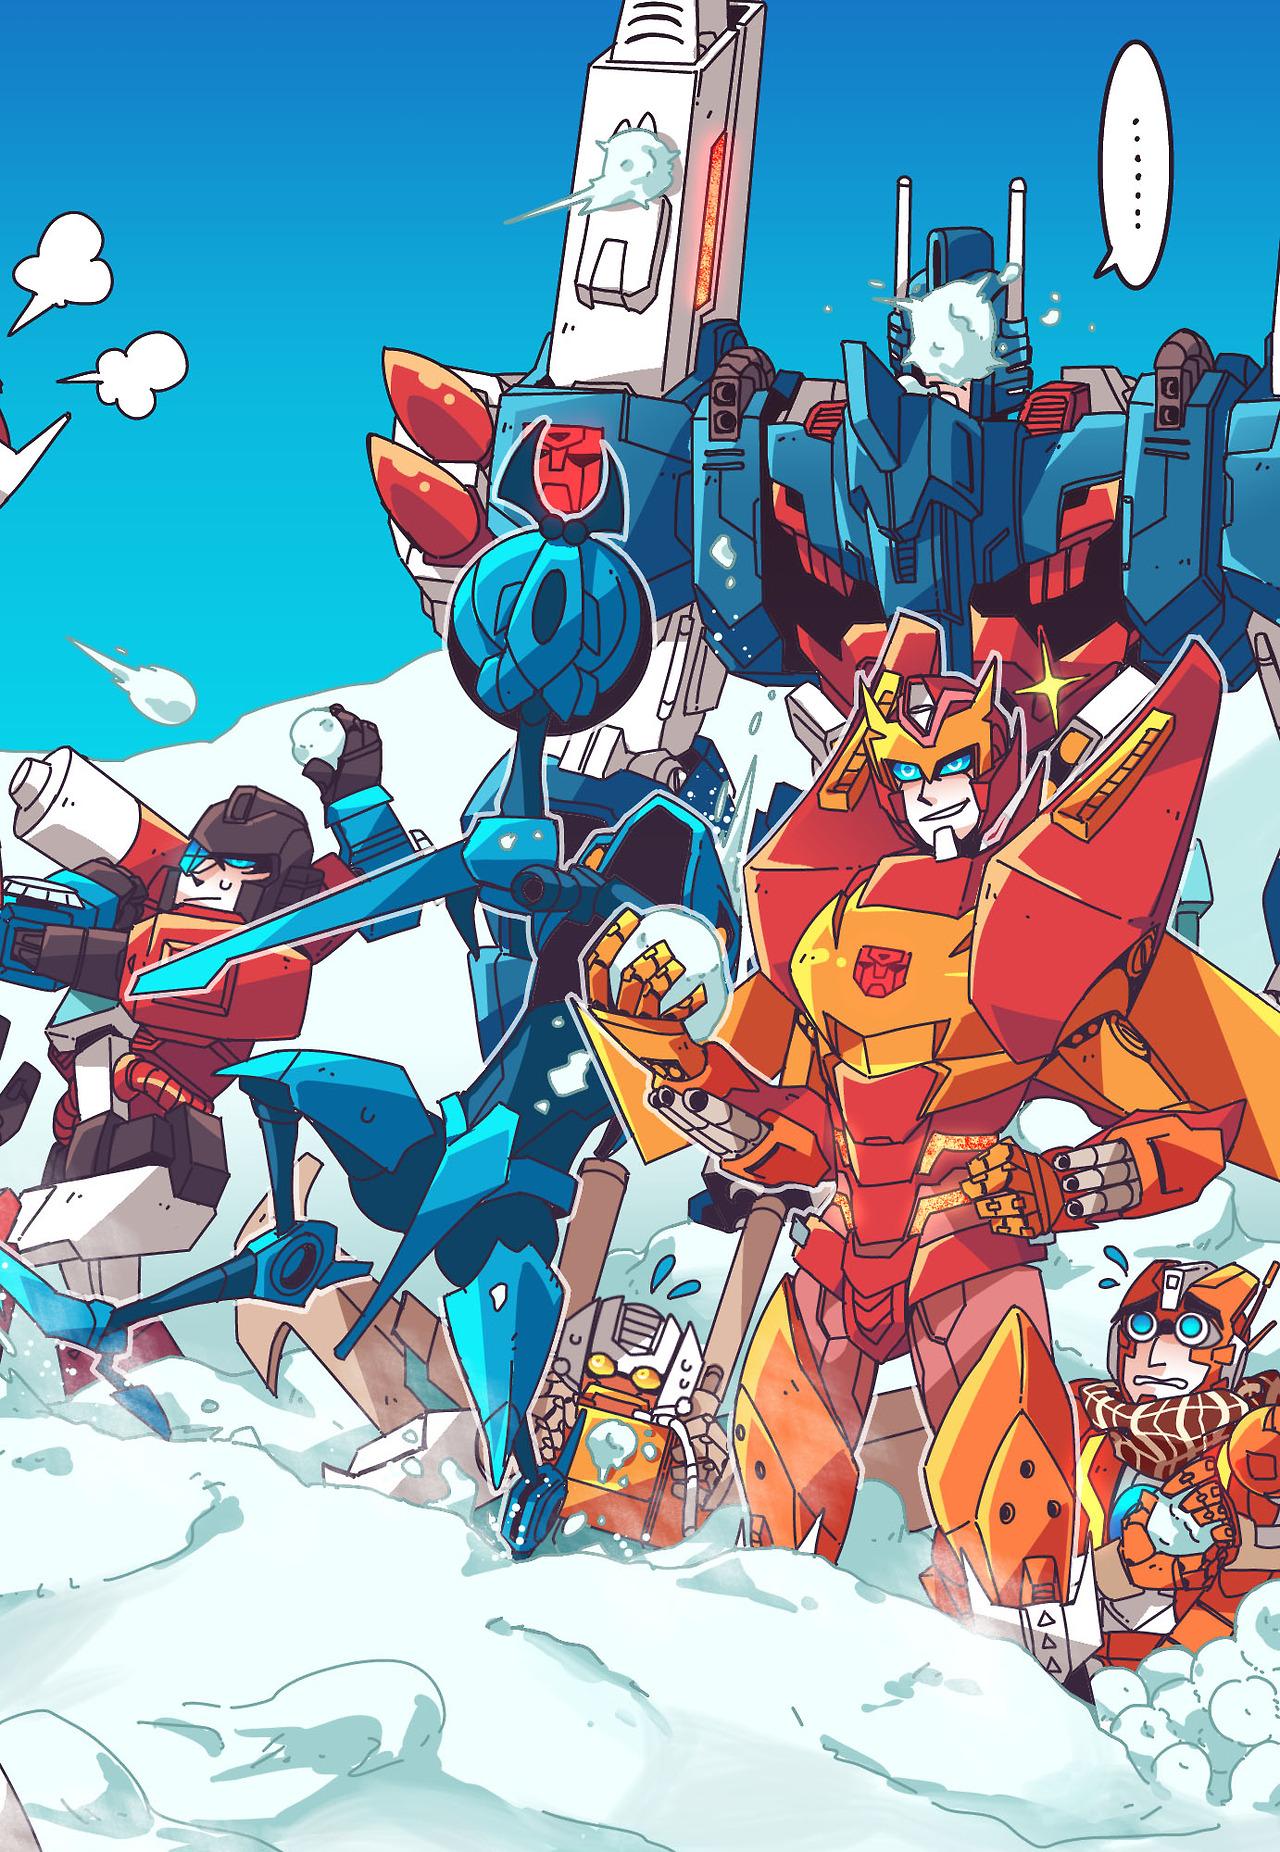 transformers image #1814122 - zerochan anime image board